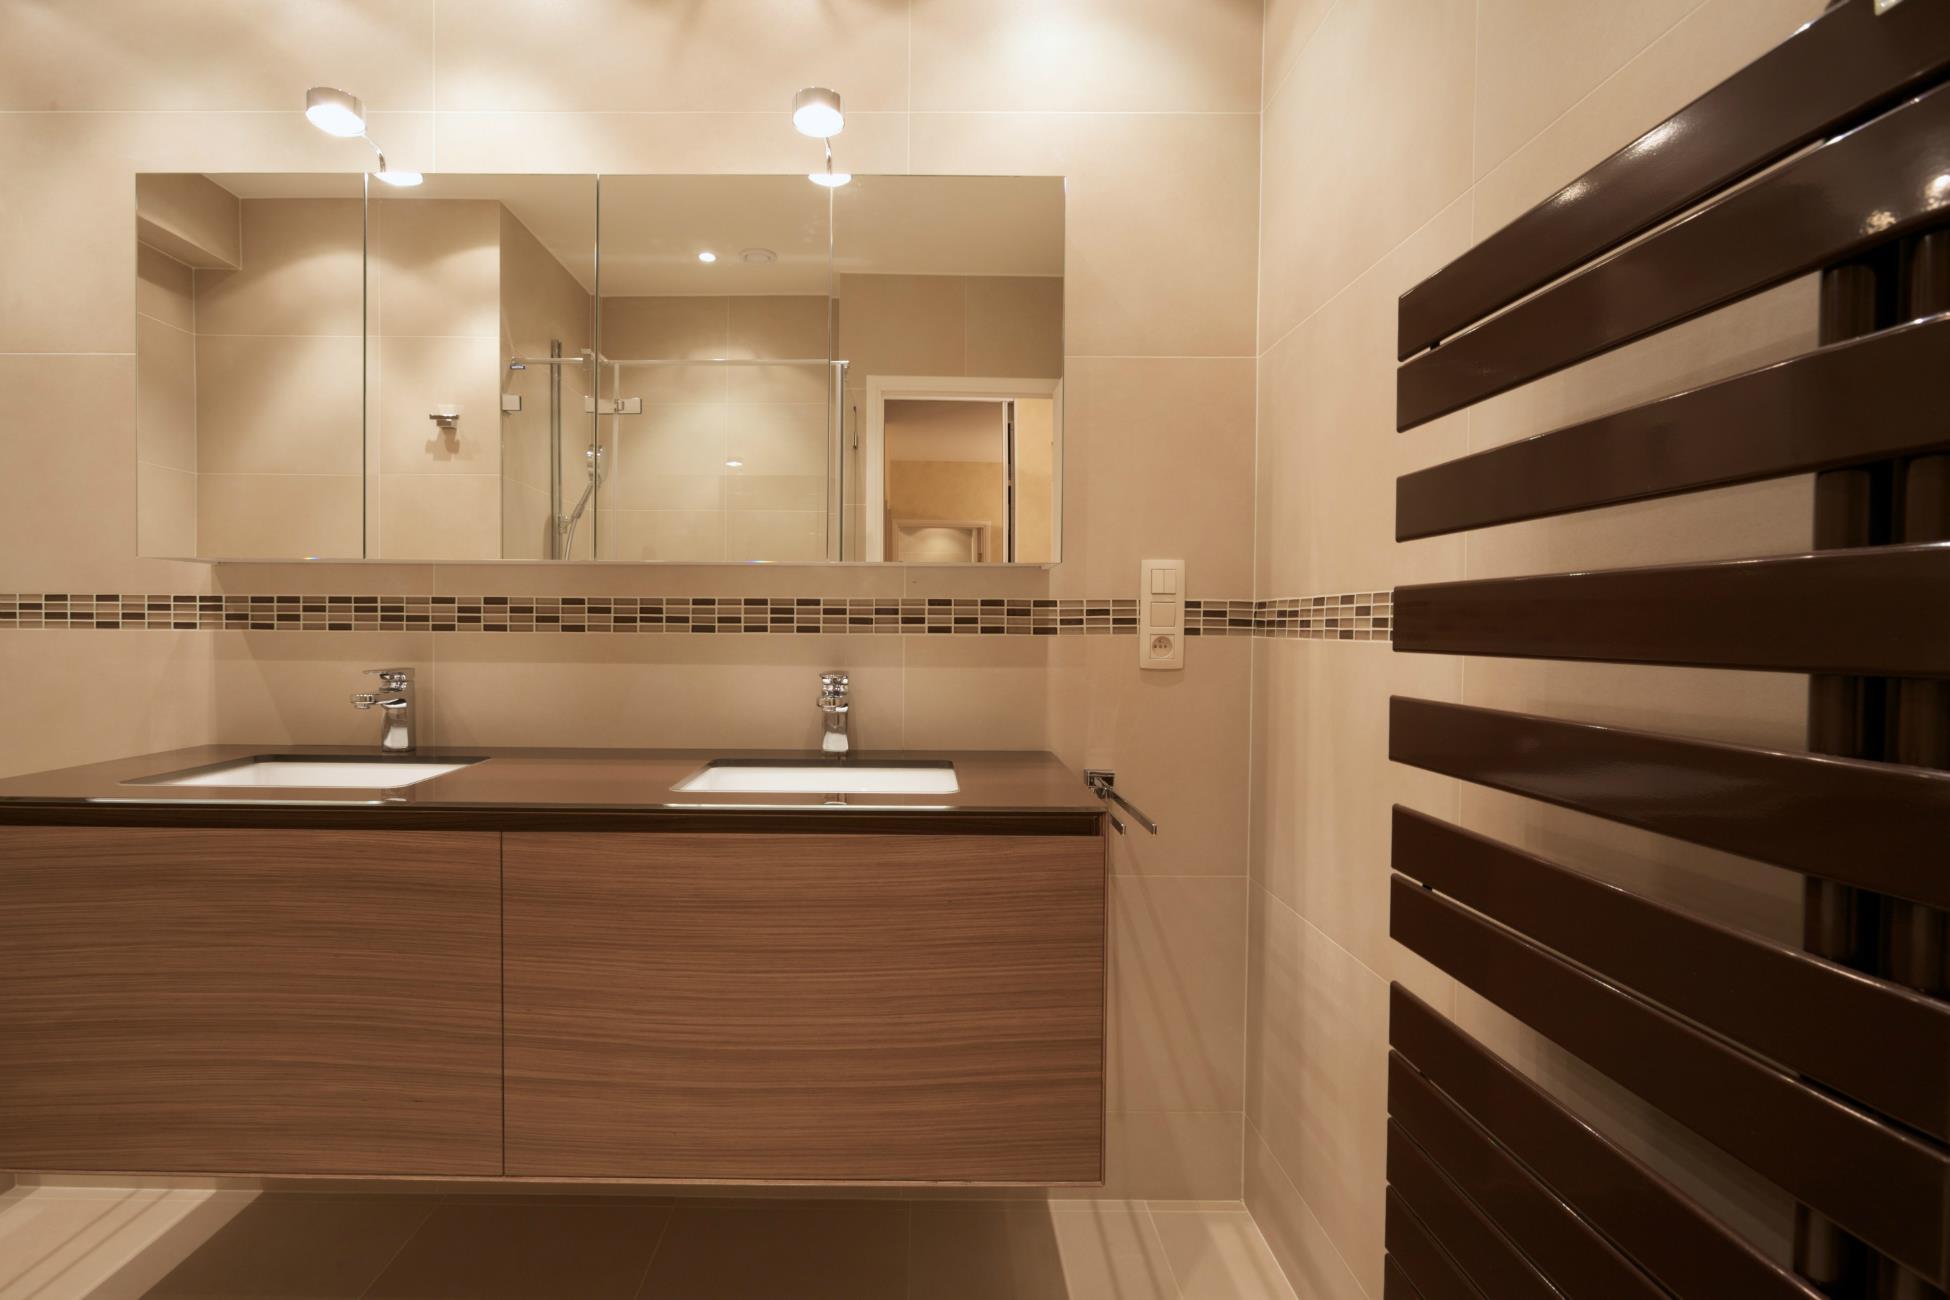 Specialiste salle de bain design r alisations renov - Specialiste salle de bain toulouse ...